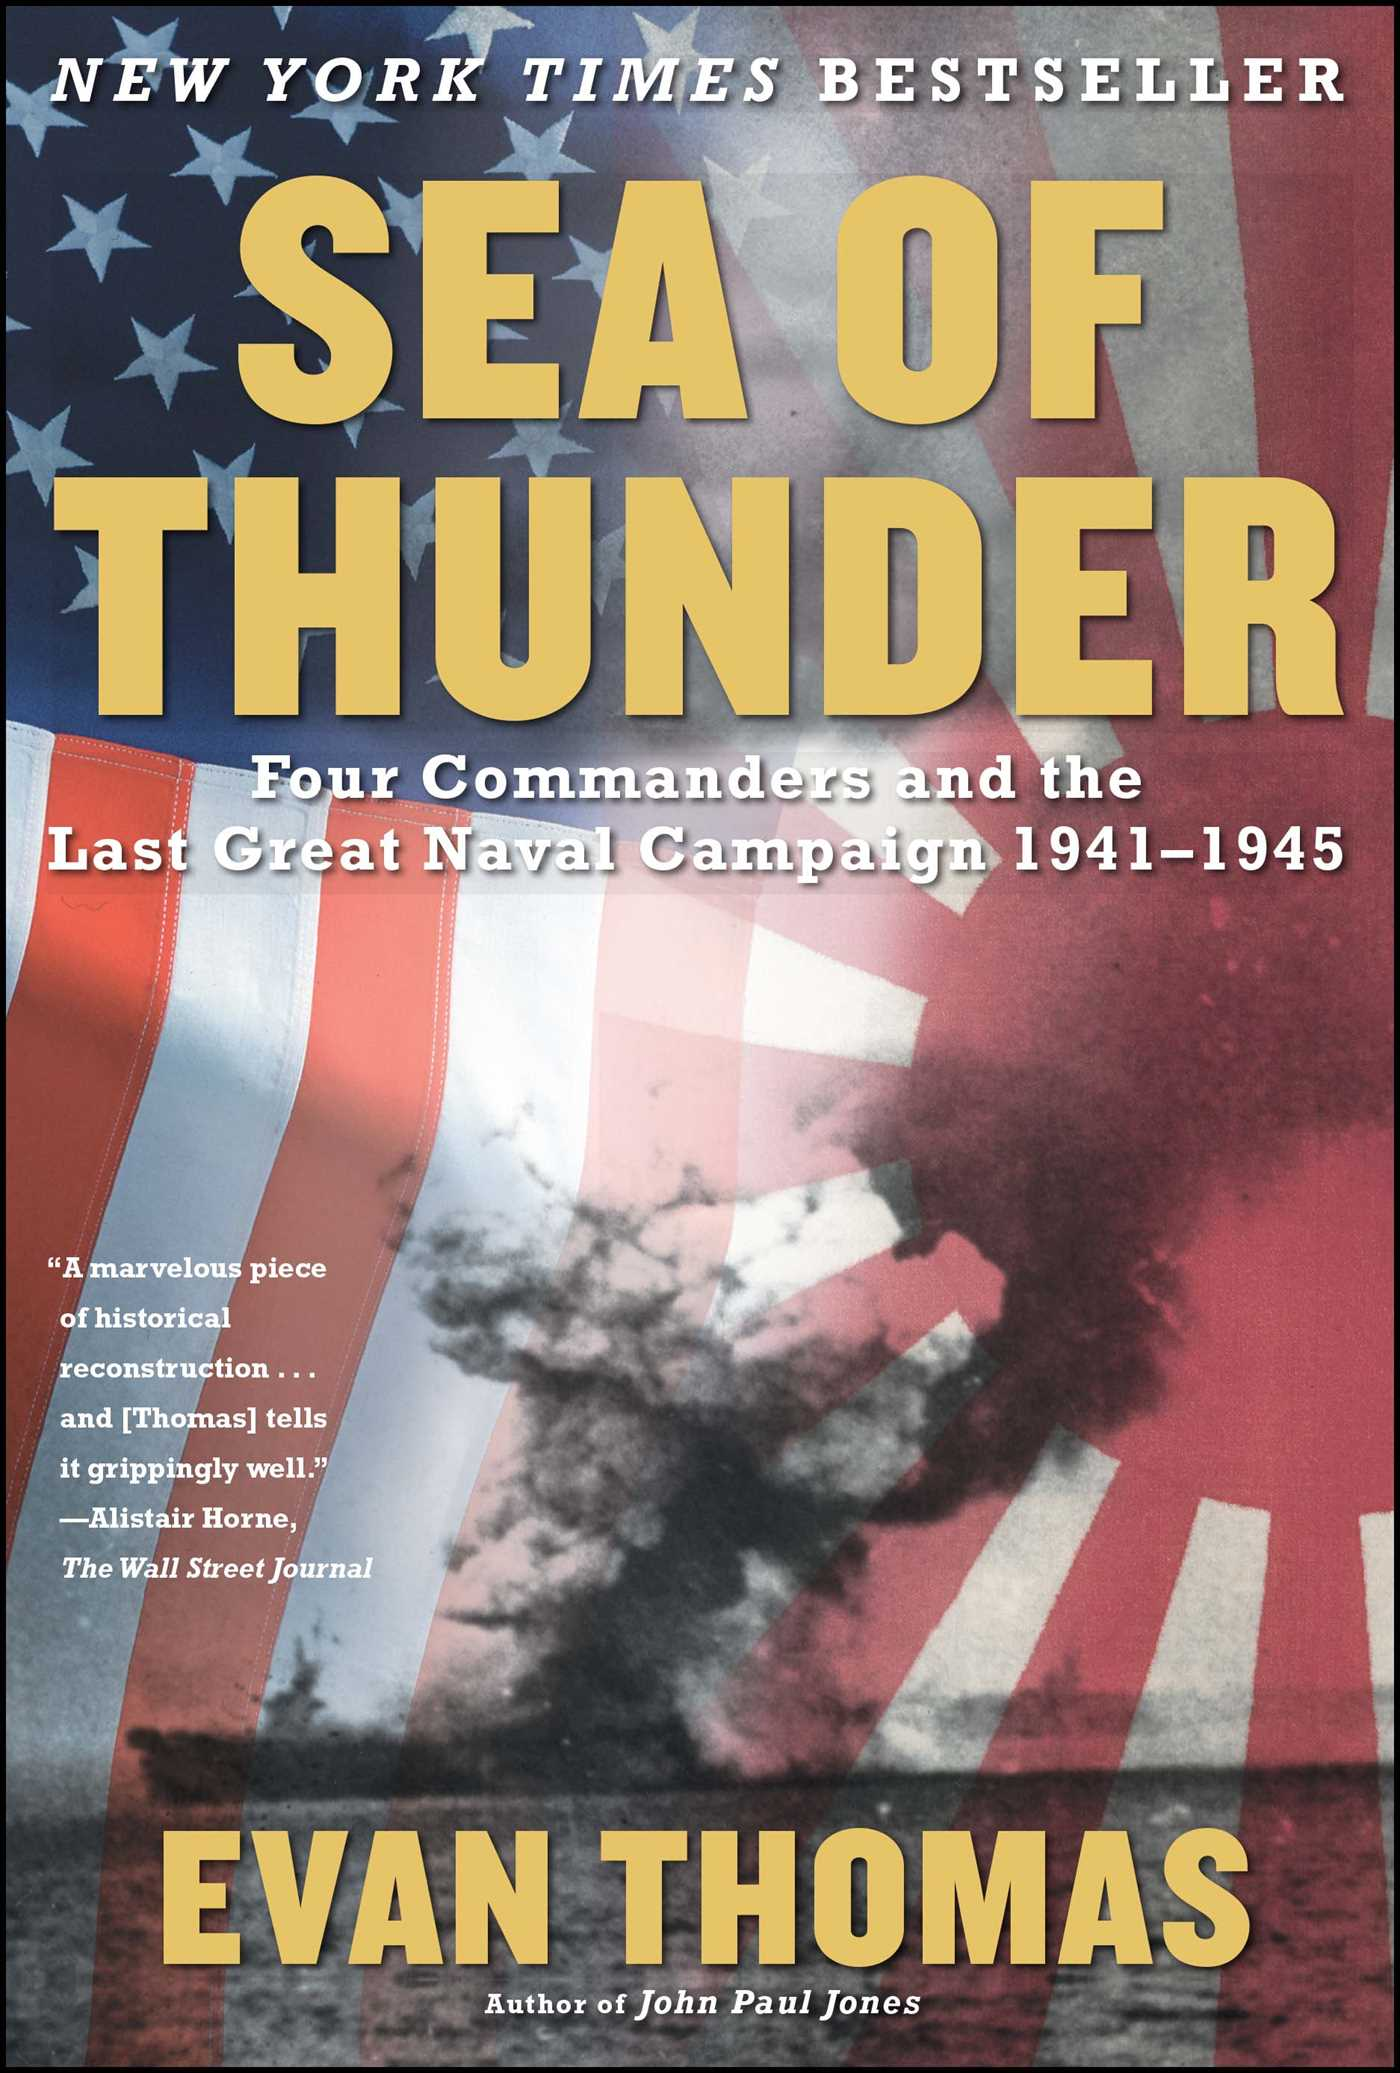 Sea of thunder 9780743252225 hr